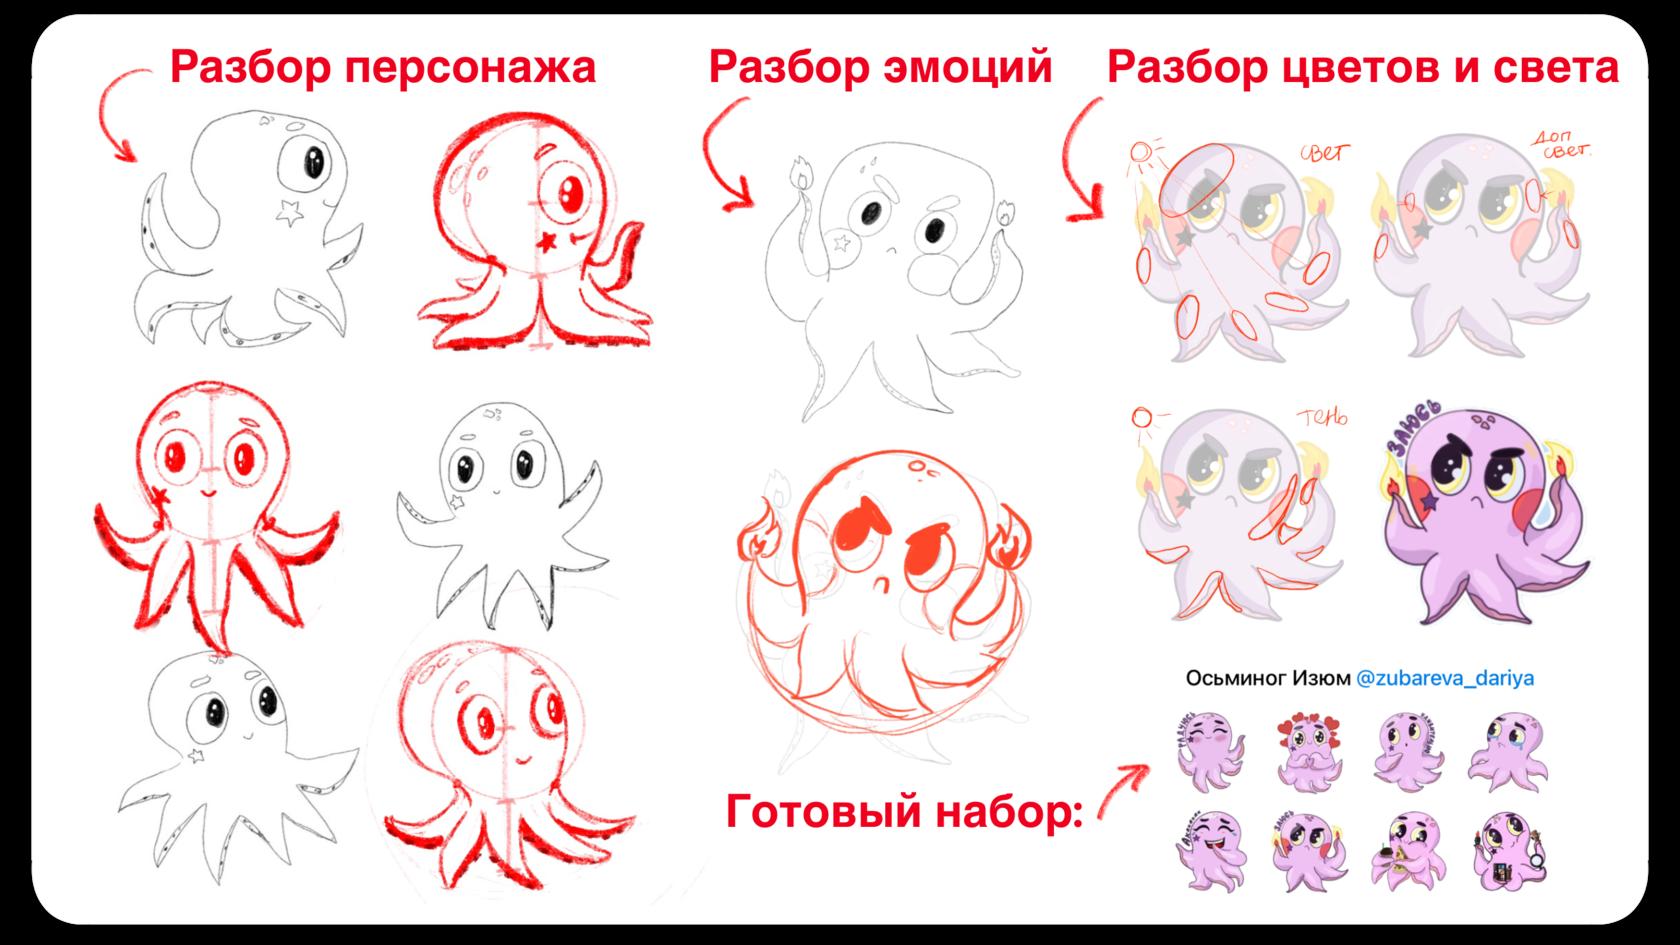 @zubareva_dariya